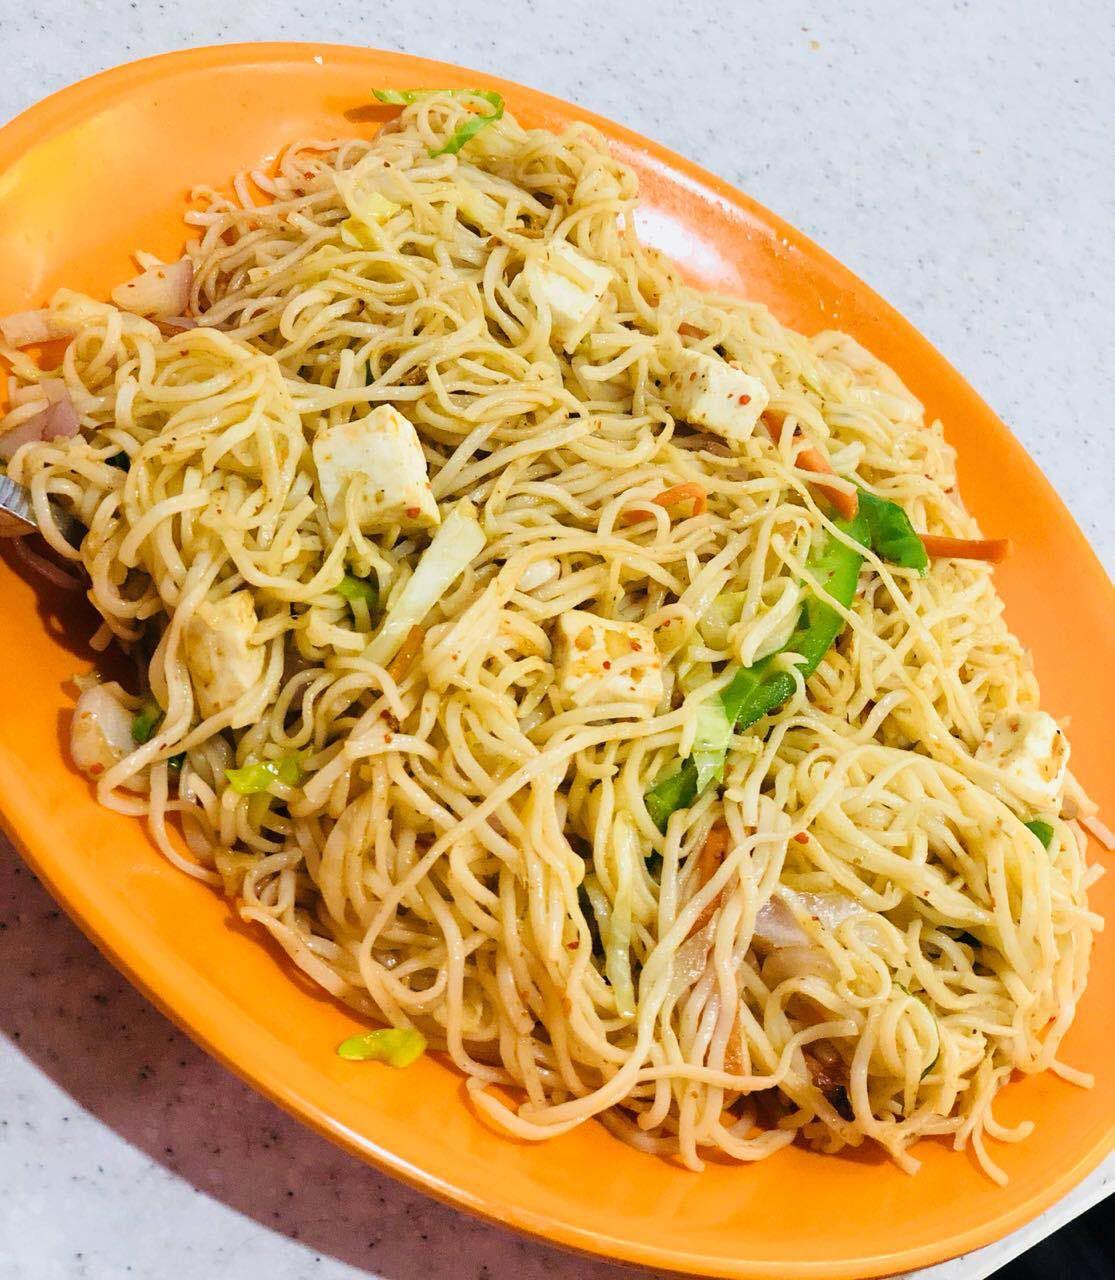 Dish,Noodle,Food,Cuisine,Spaghetti,Chow mein,Chinese noodles,Capellini,Rice noodles,Shirataki noodles